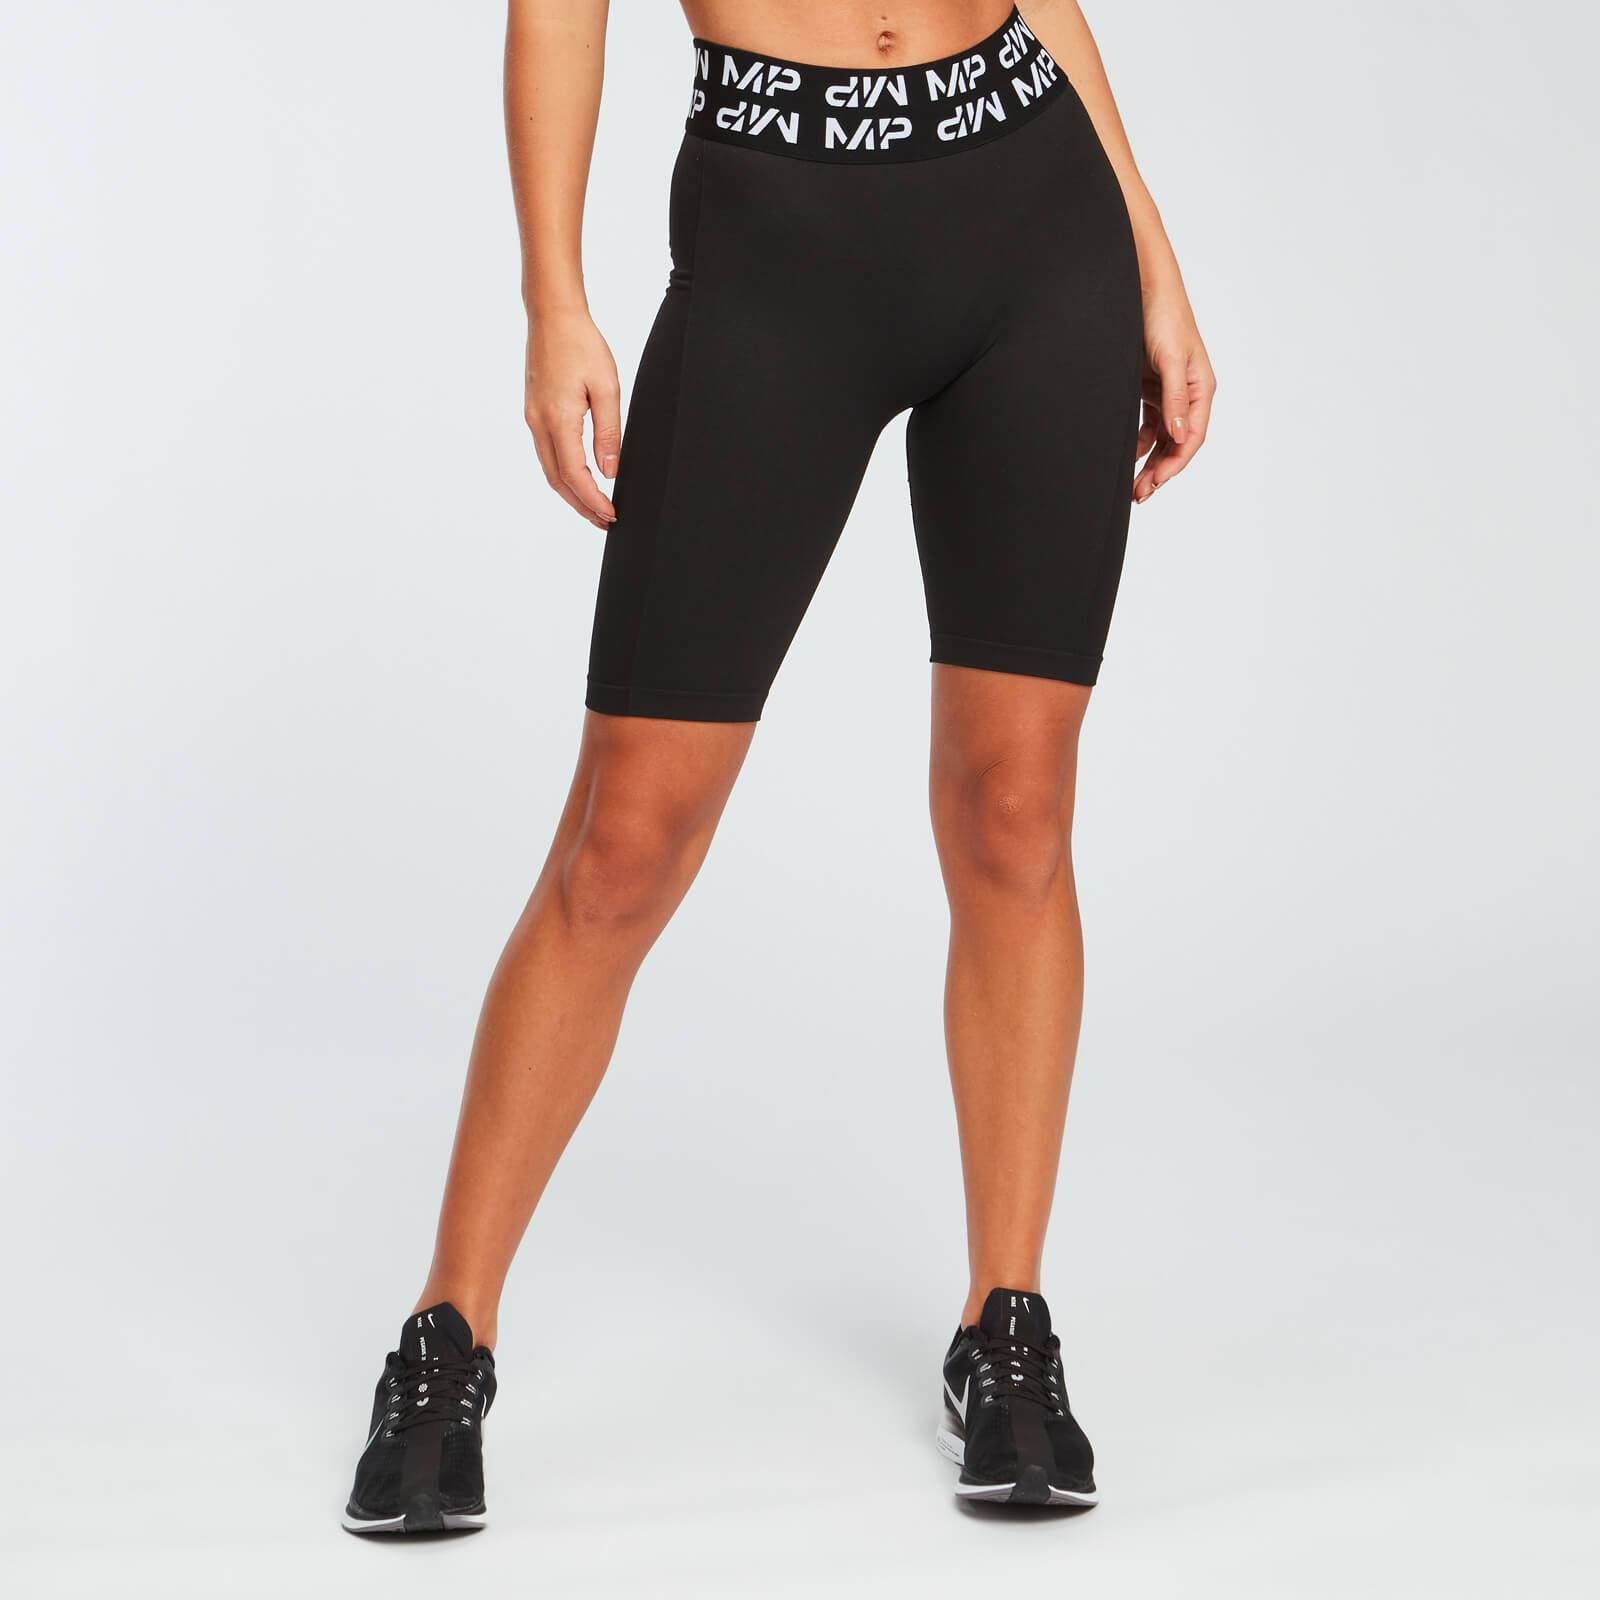 MP Curve Cycling Shorts - Sort - L